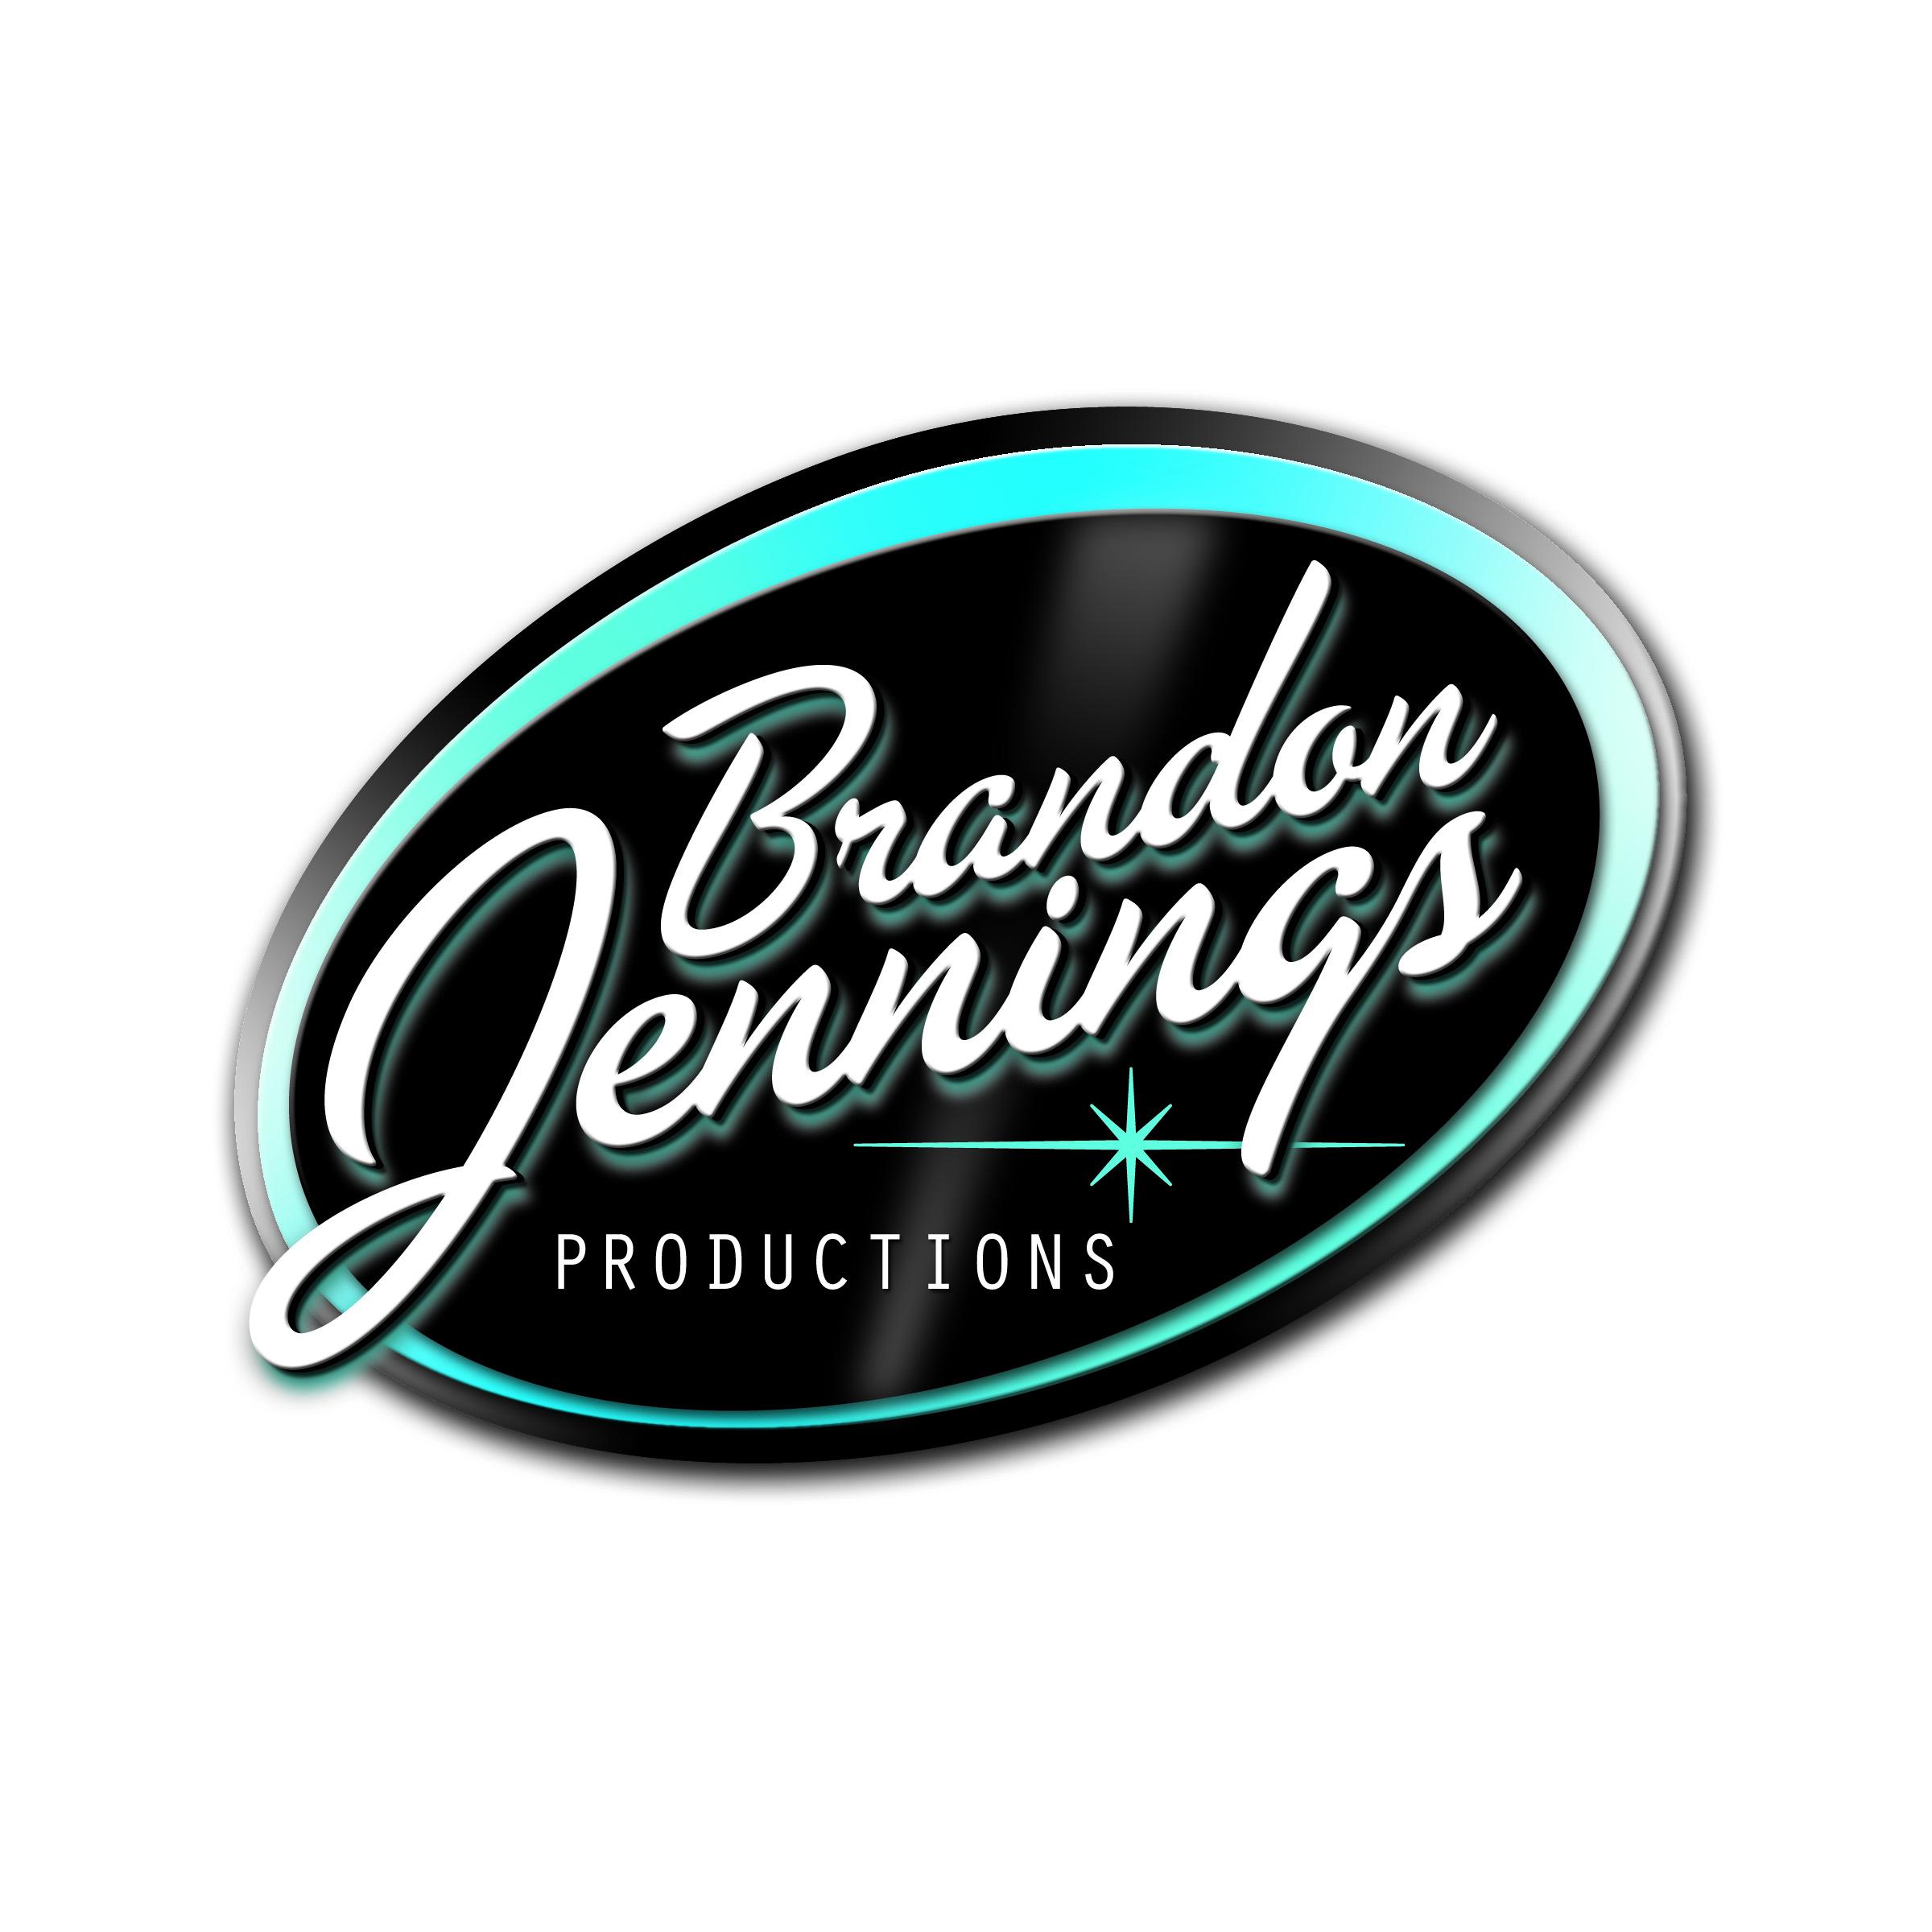 BrandonJenningsLogo.jpg